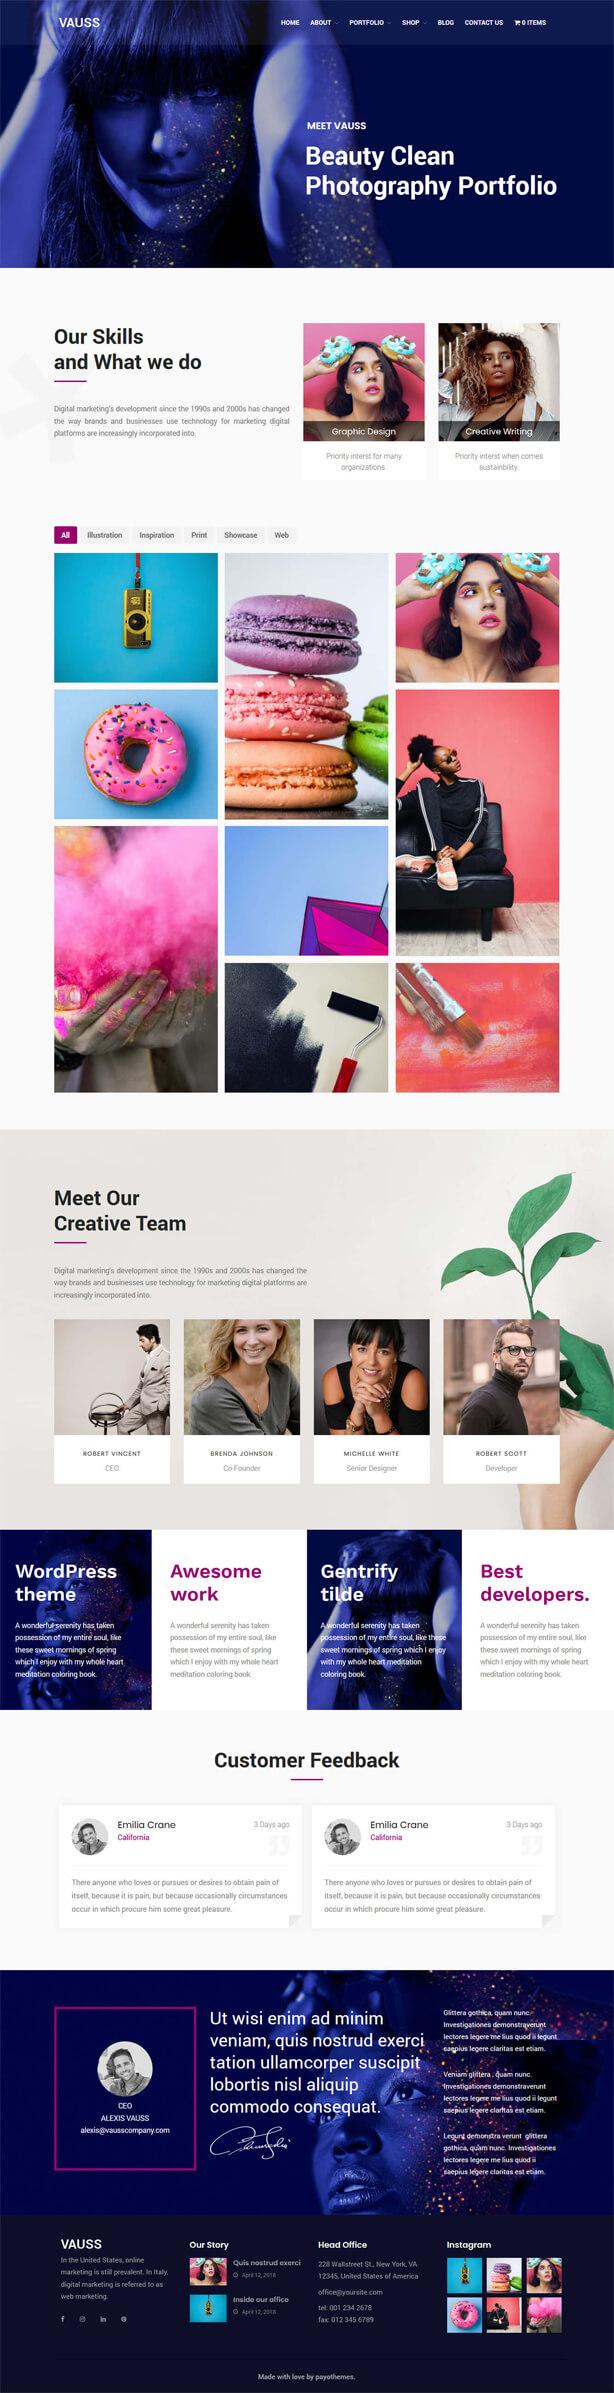 VAUSS - Portfolio and Personal Services WordPress Theme - 1